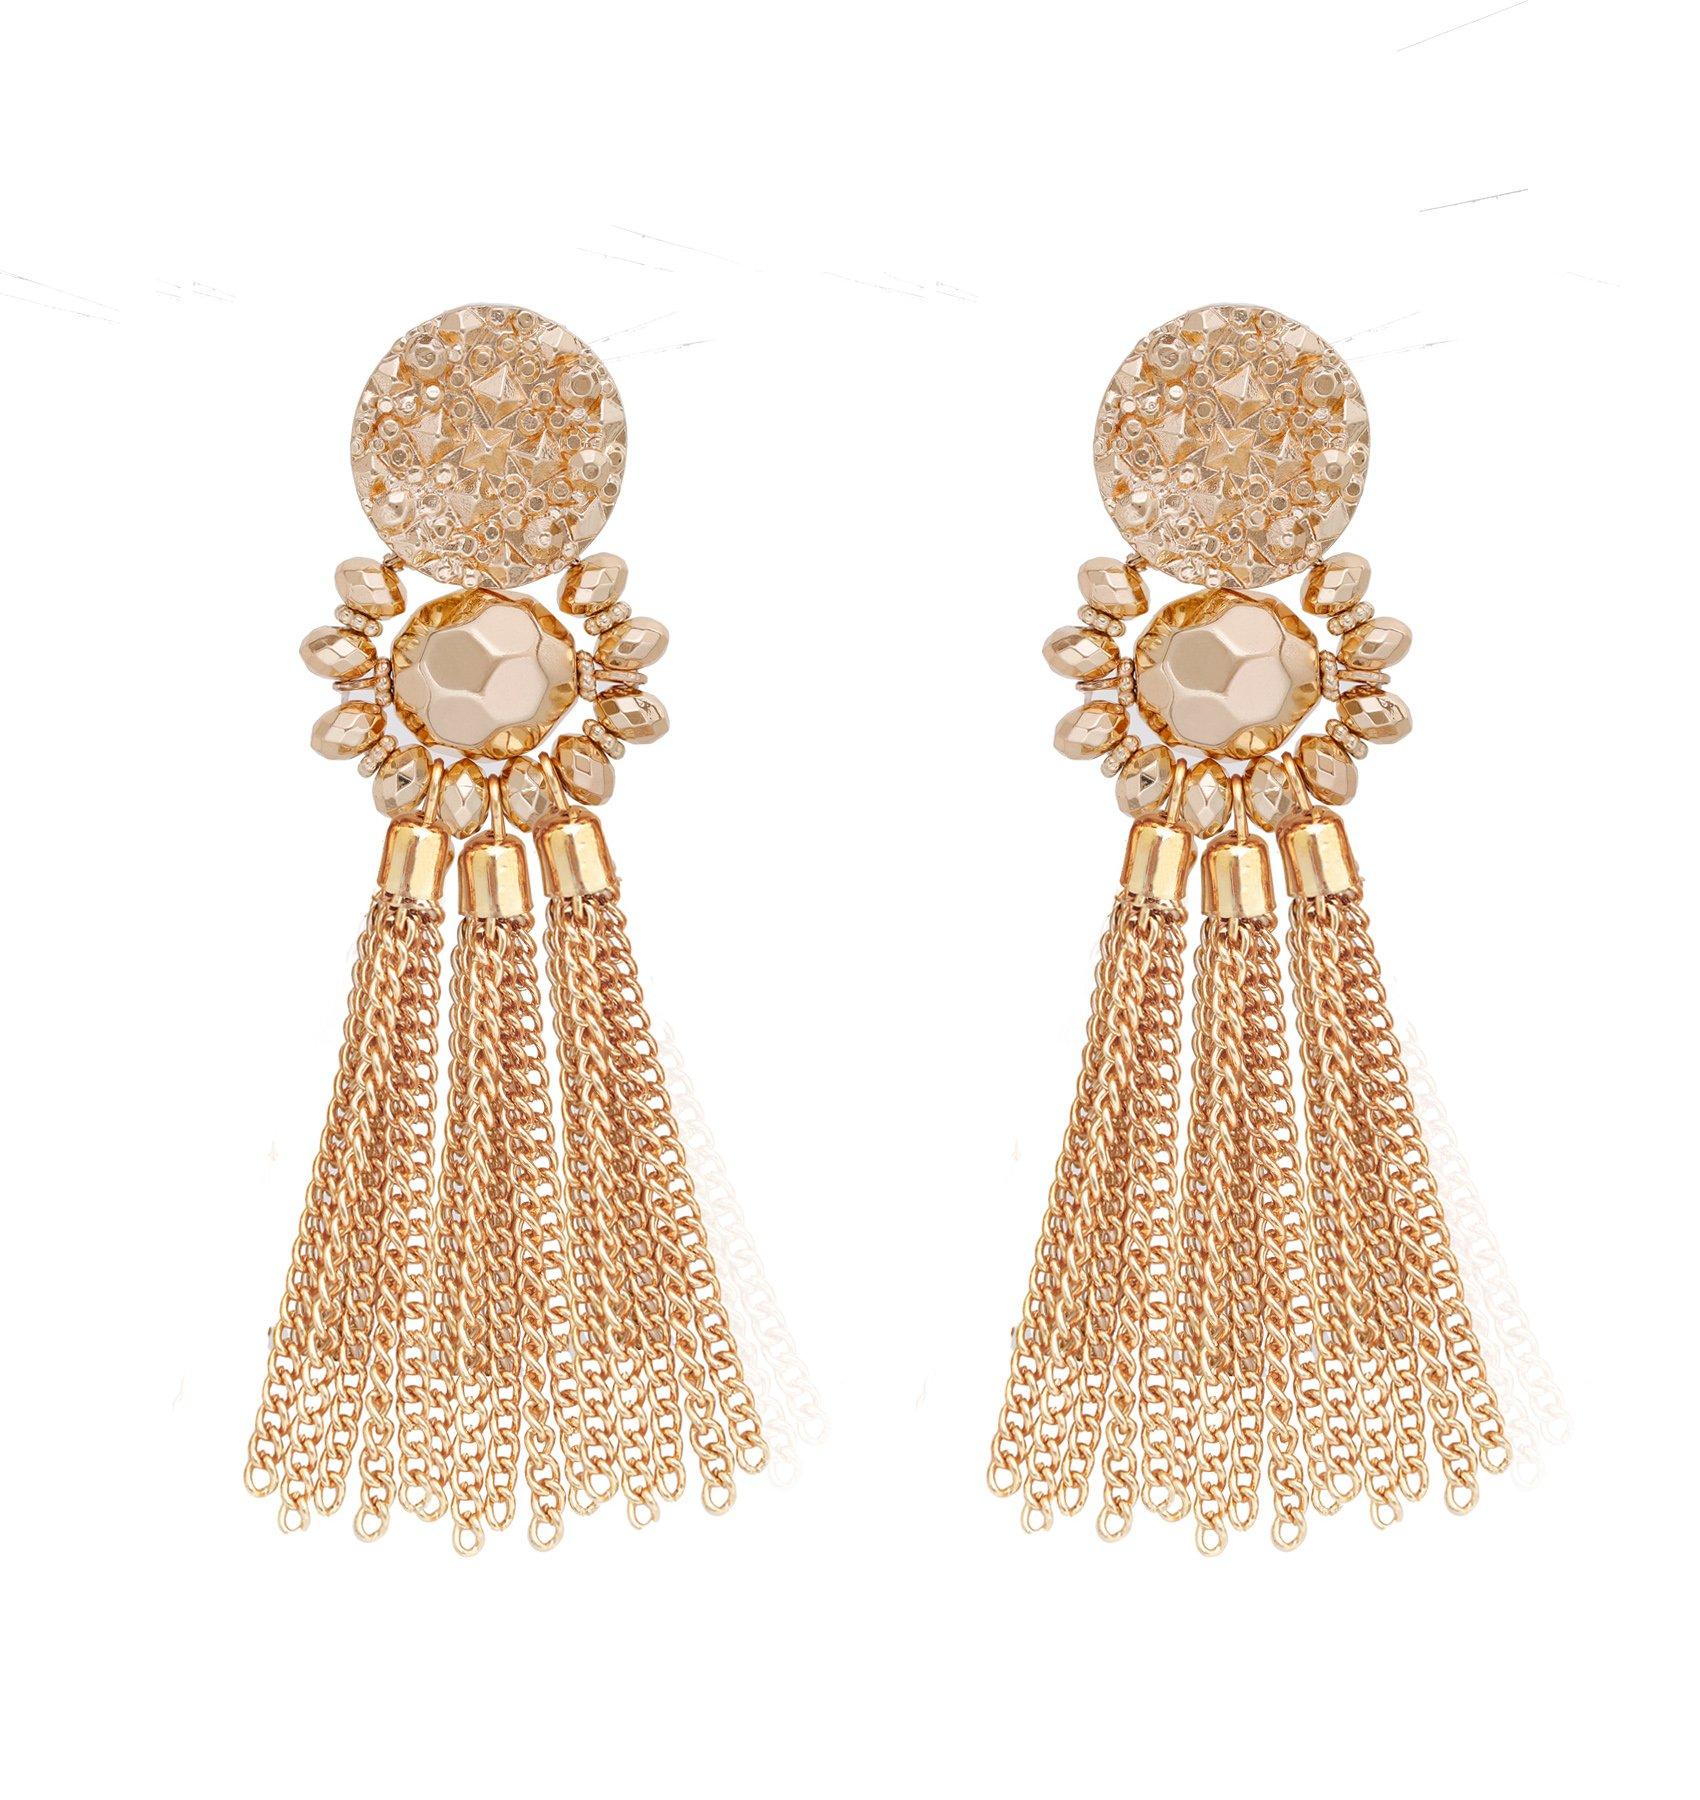 Bohemian Statement Tassel Chandelier Drop Dangle Earrings with Cassandra Button Stud (gold) by LPON (Image #1)